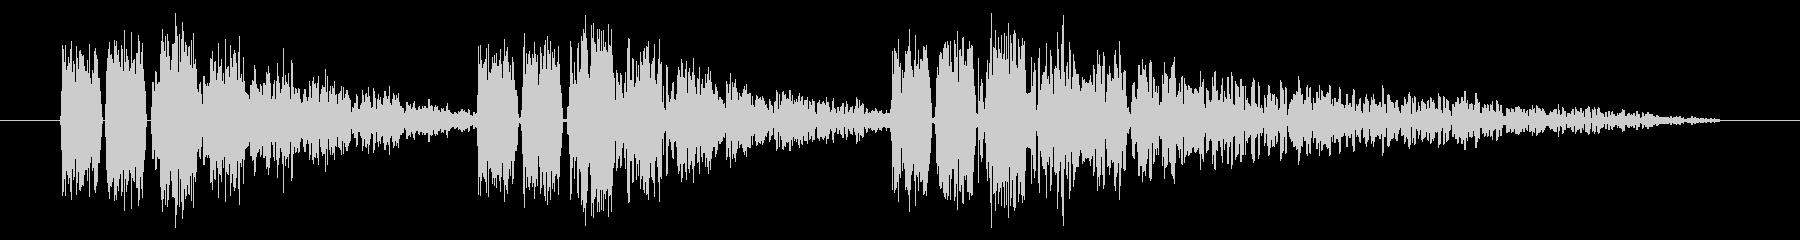 SNES-RPG05-16(倒す)の未再生の波形